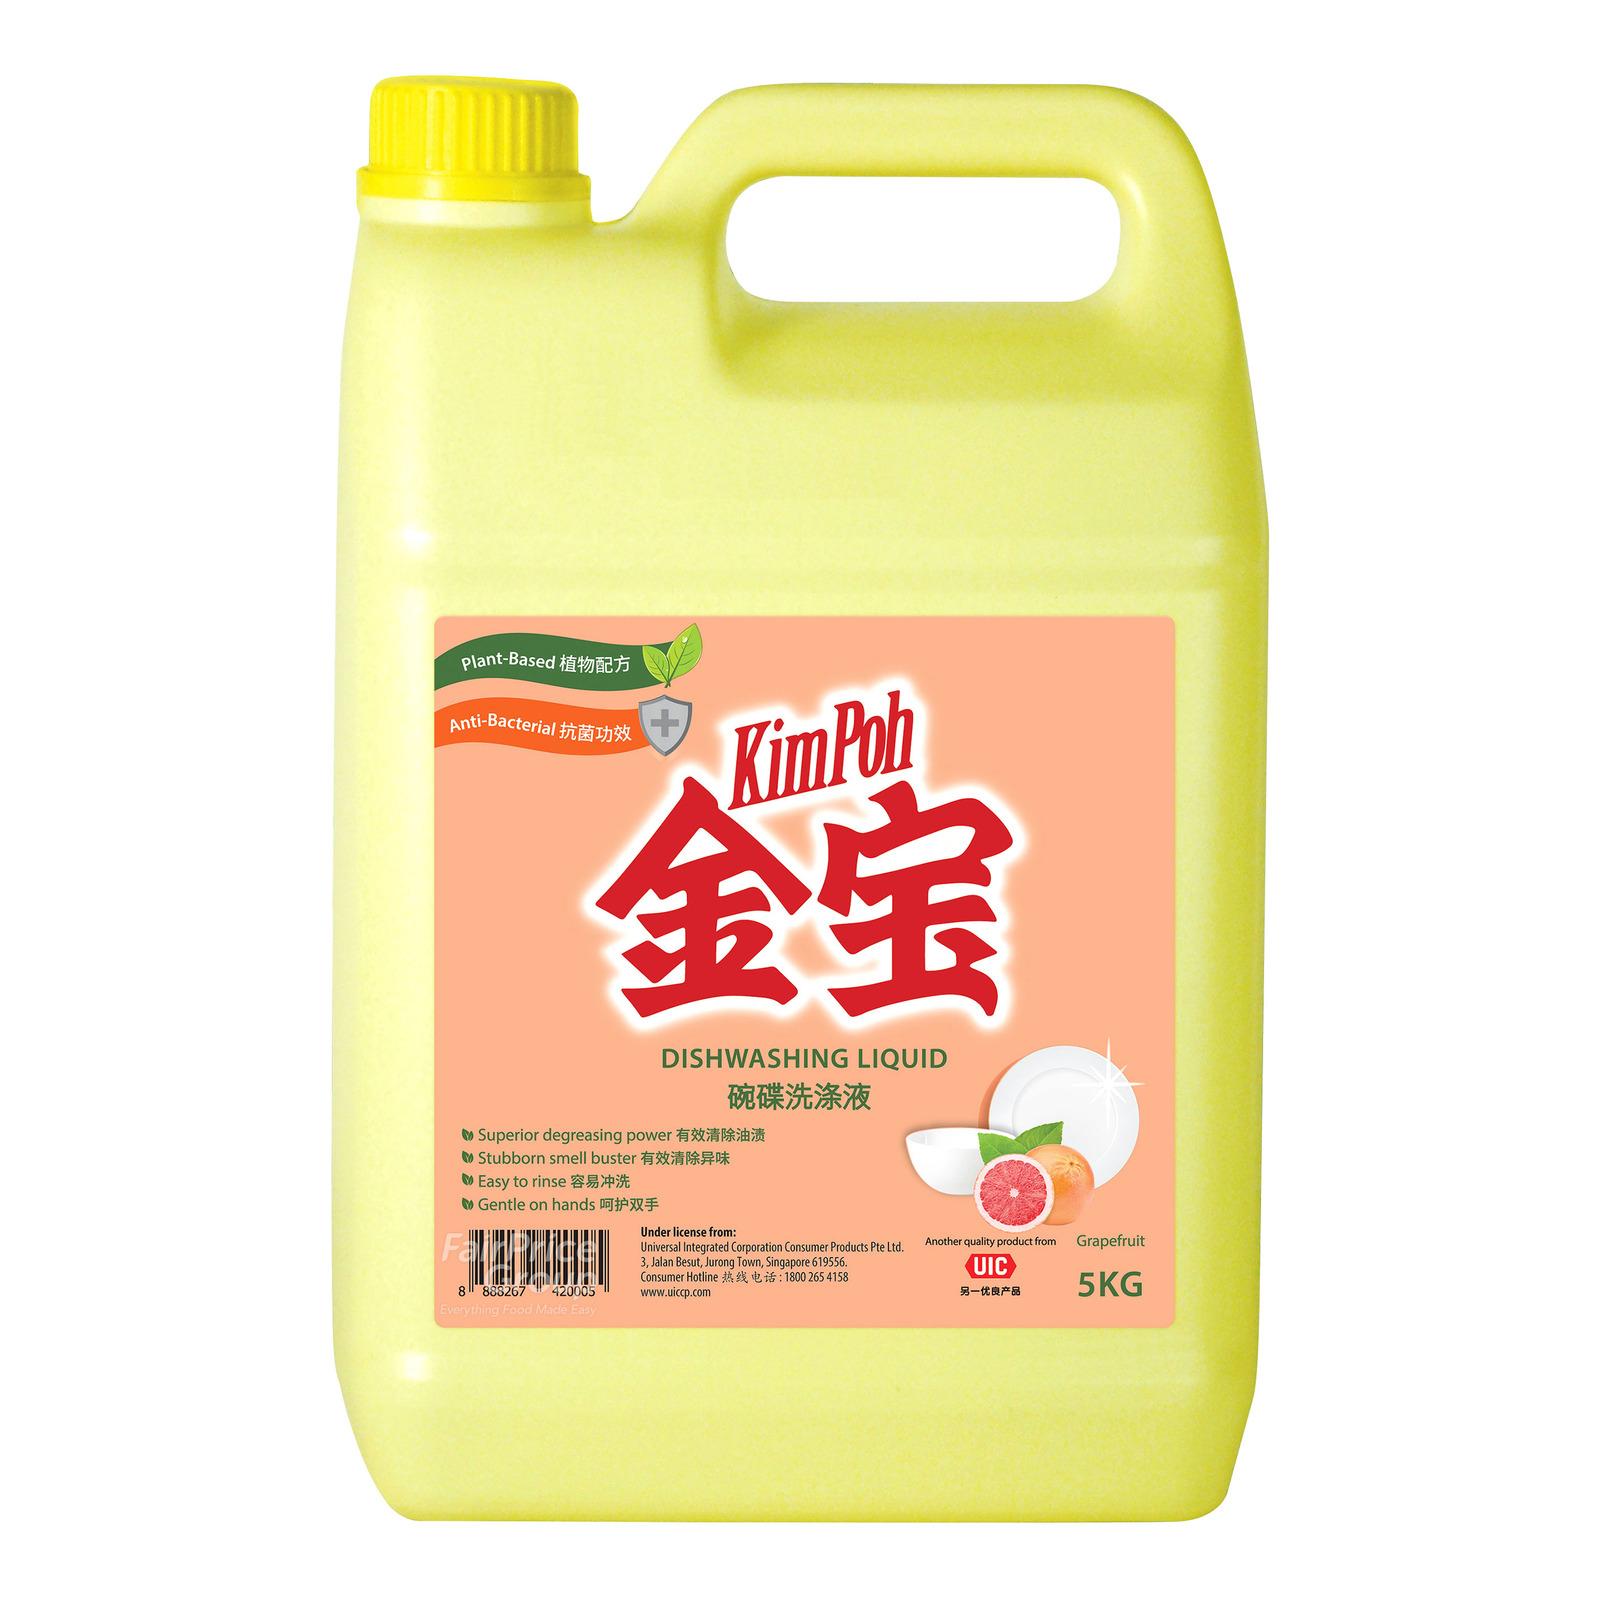 Kim Poh Dishwashing Liquid - Anti-Bacterial